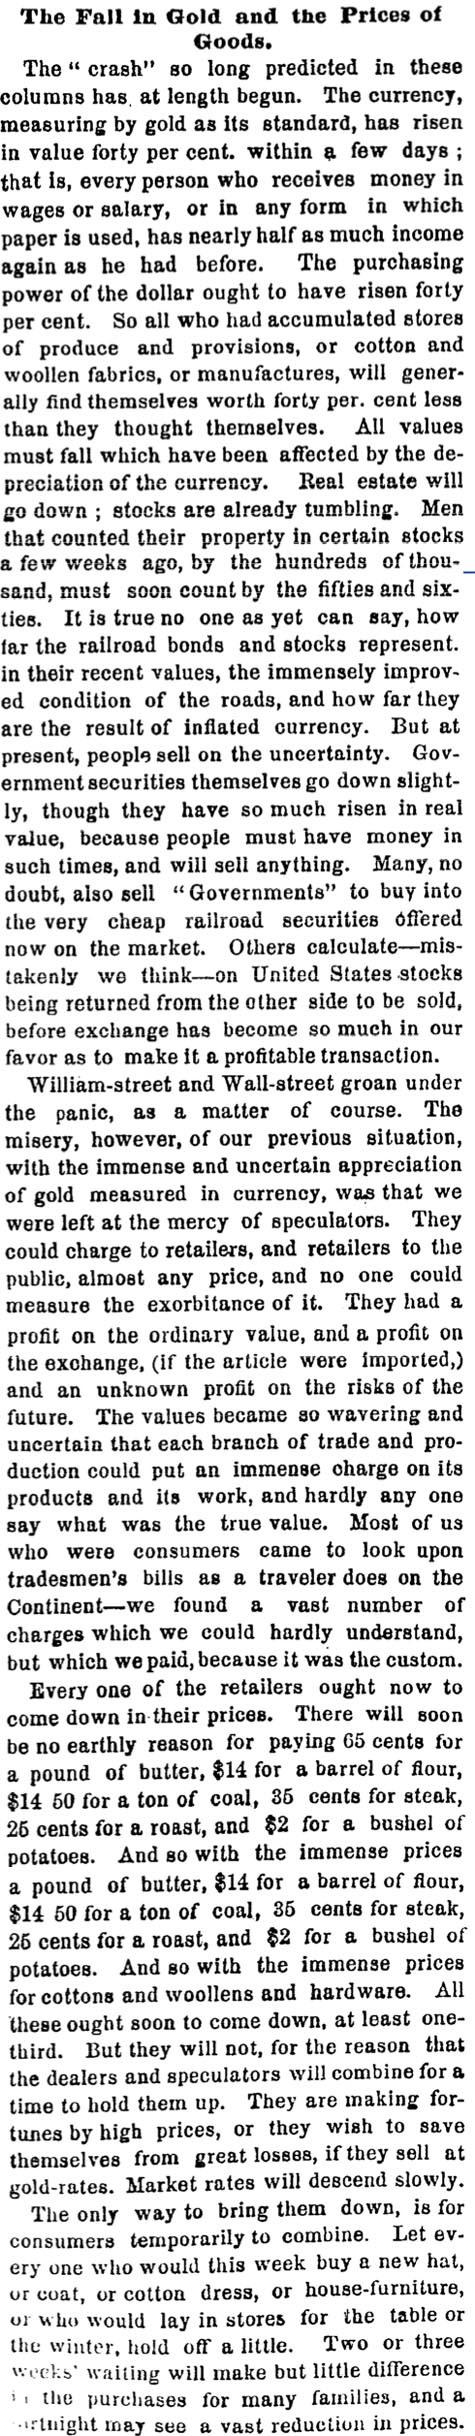 Nyt_gold_crash_1864